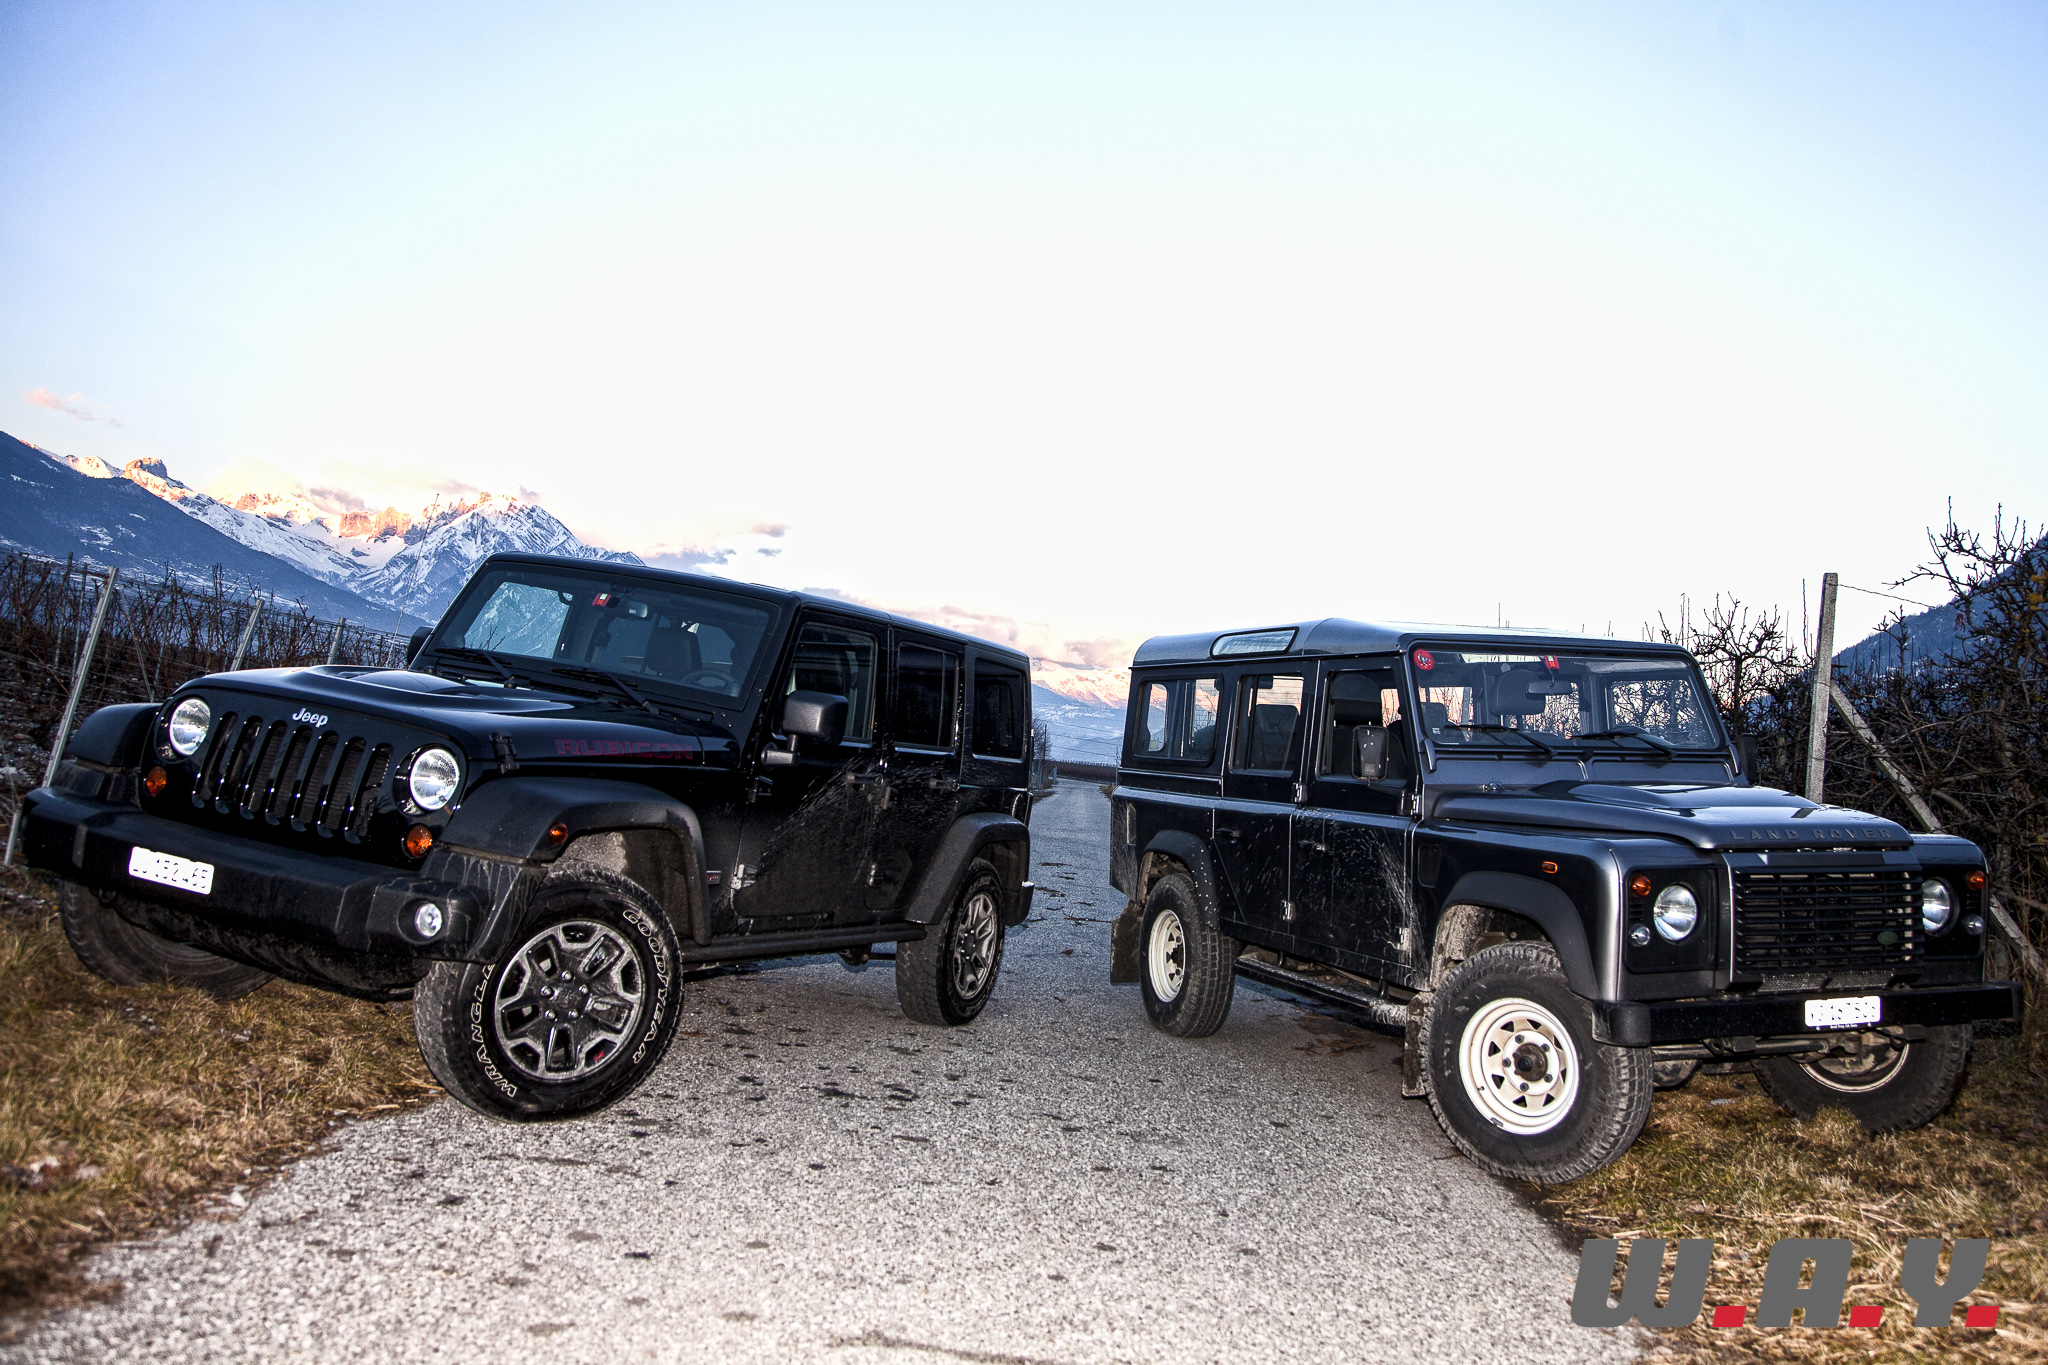 JeepWrangler-37